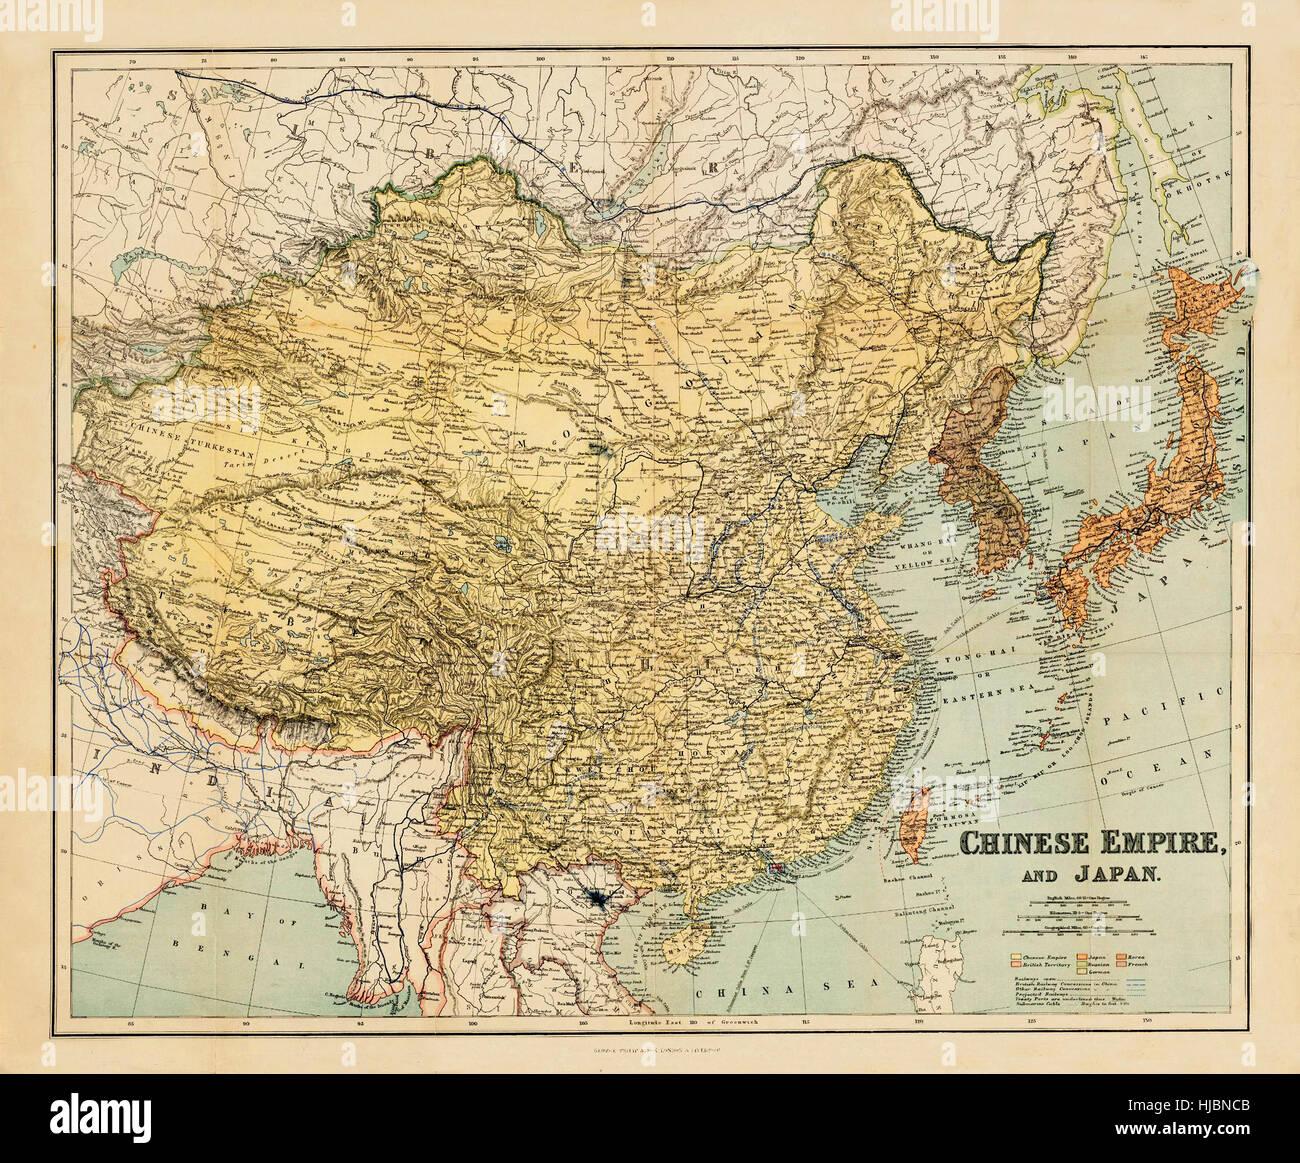 Map Of China Stock Photo Royalty Free Image Alamy - Japan map 1900